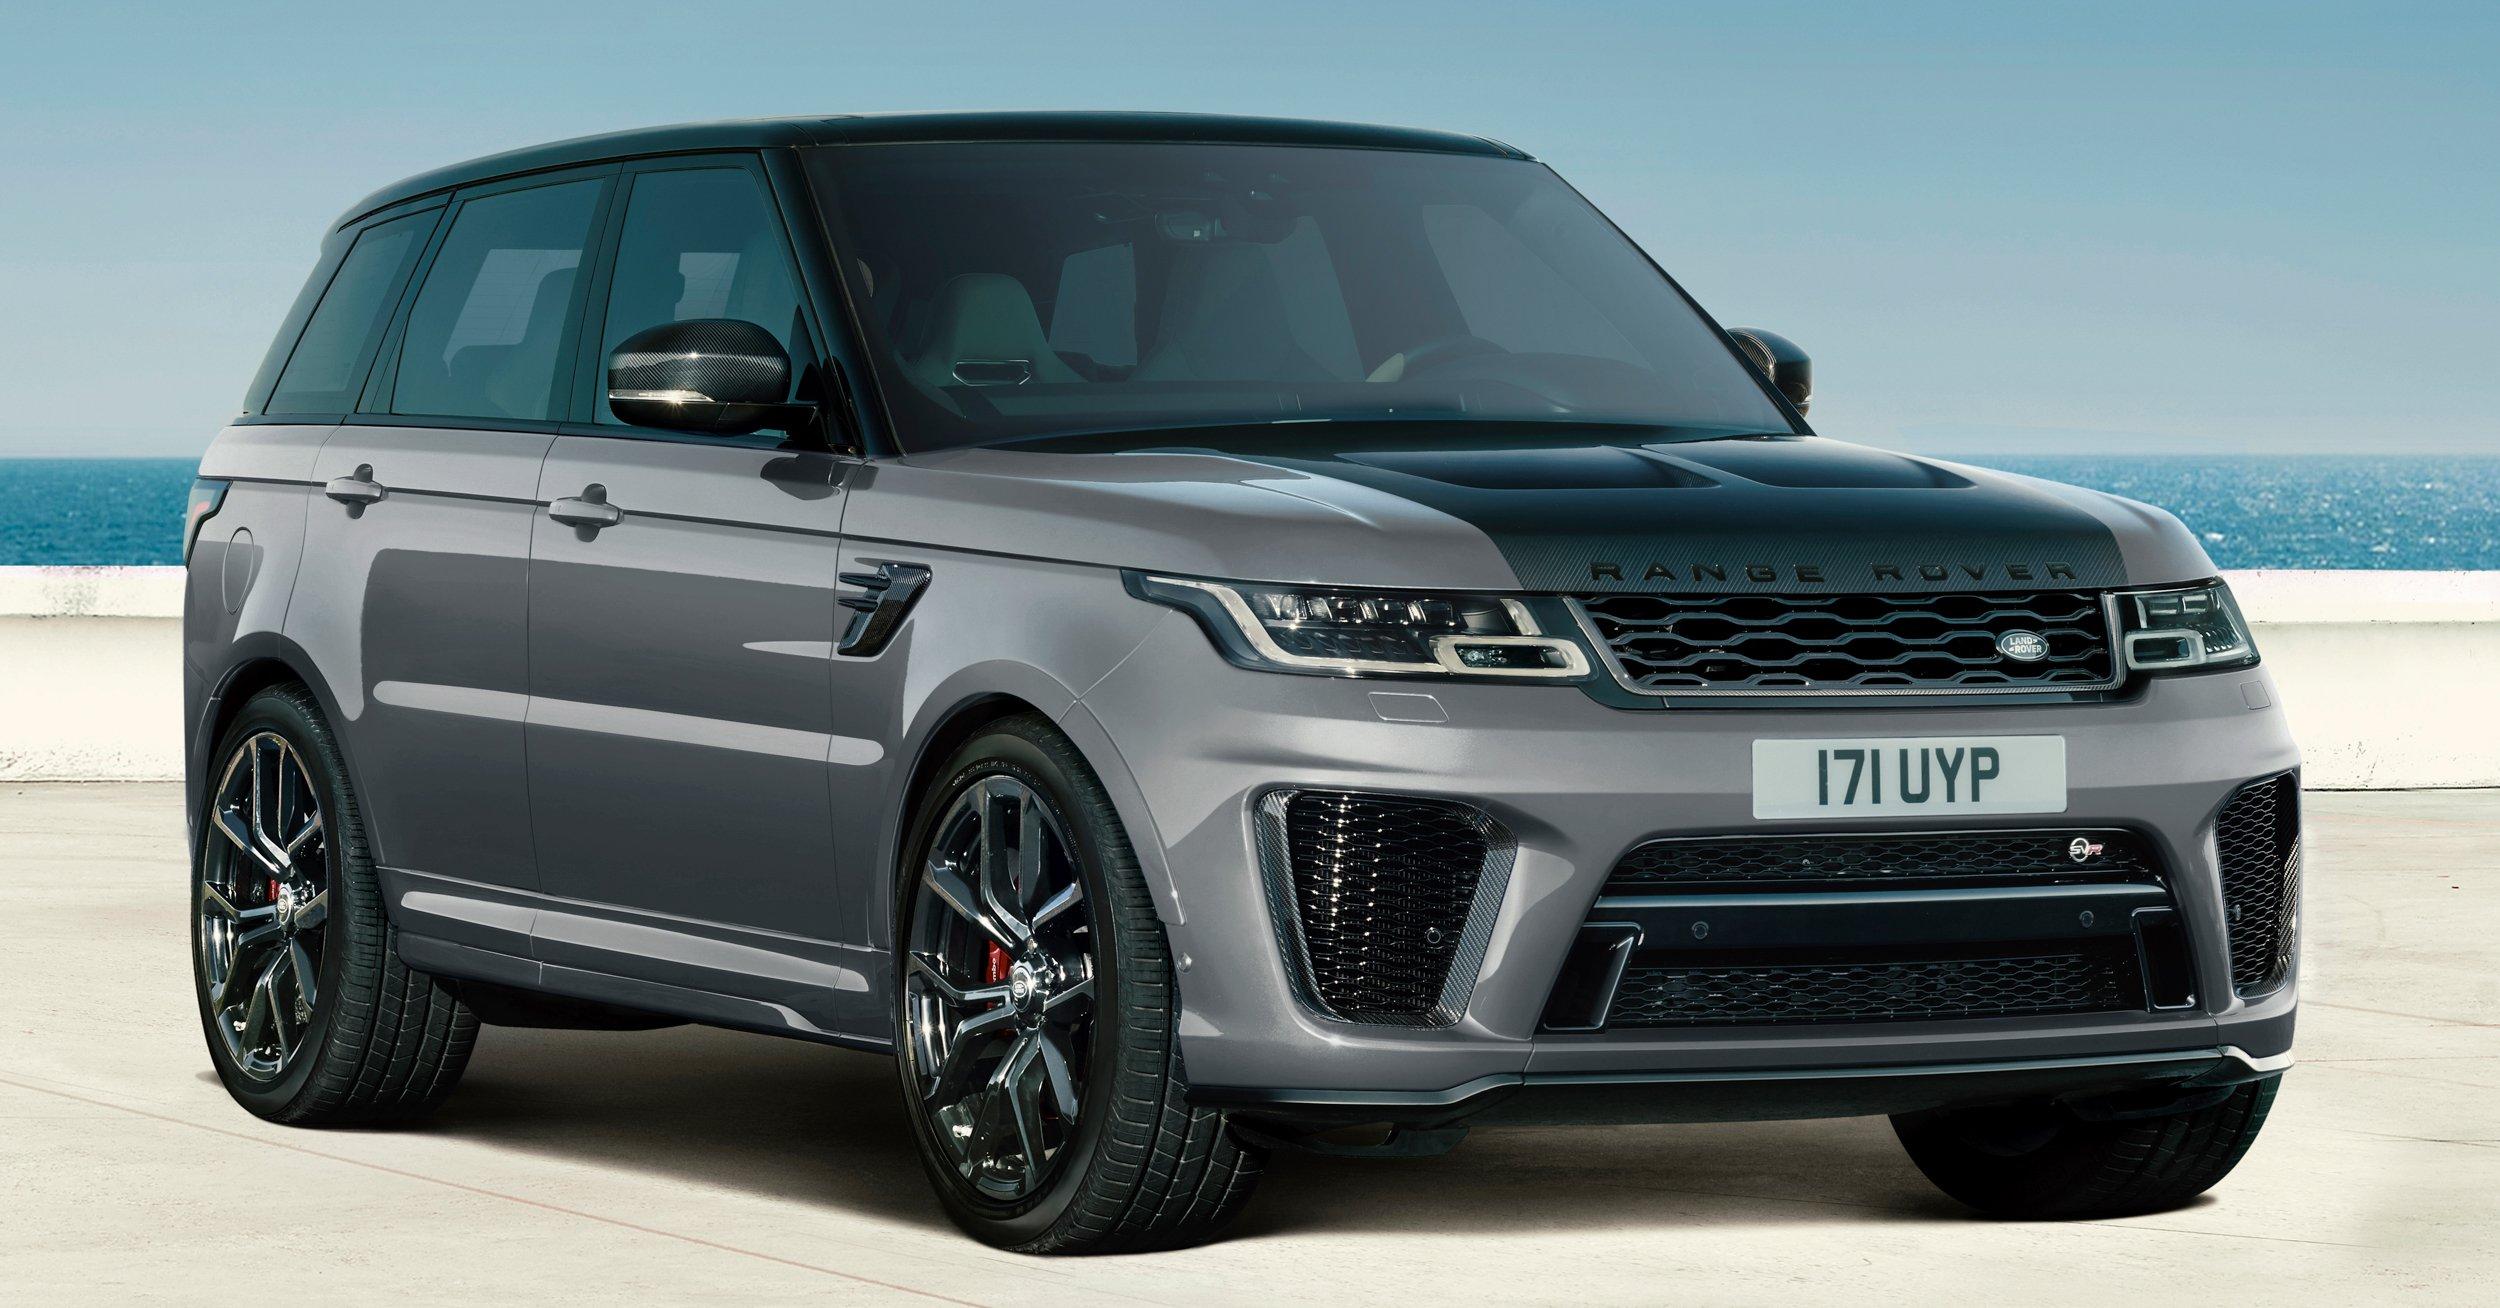 2021 Range Rover Sport Svr Carbon Edition Hse Dynamic Black Hse Silver Special Edition Models Paultan Org